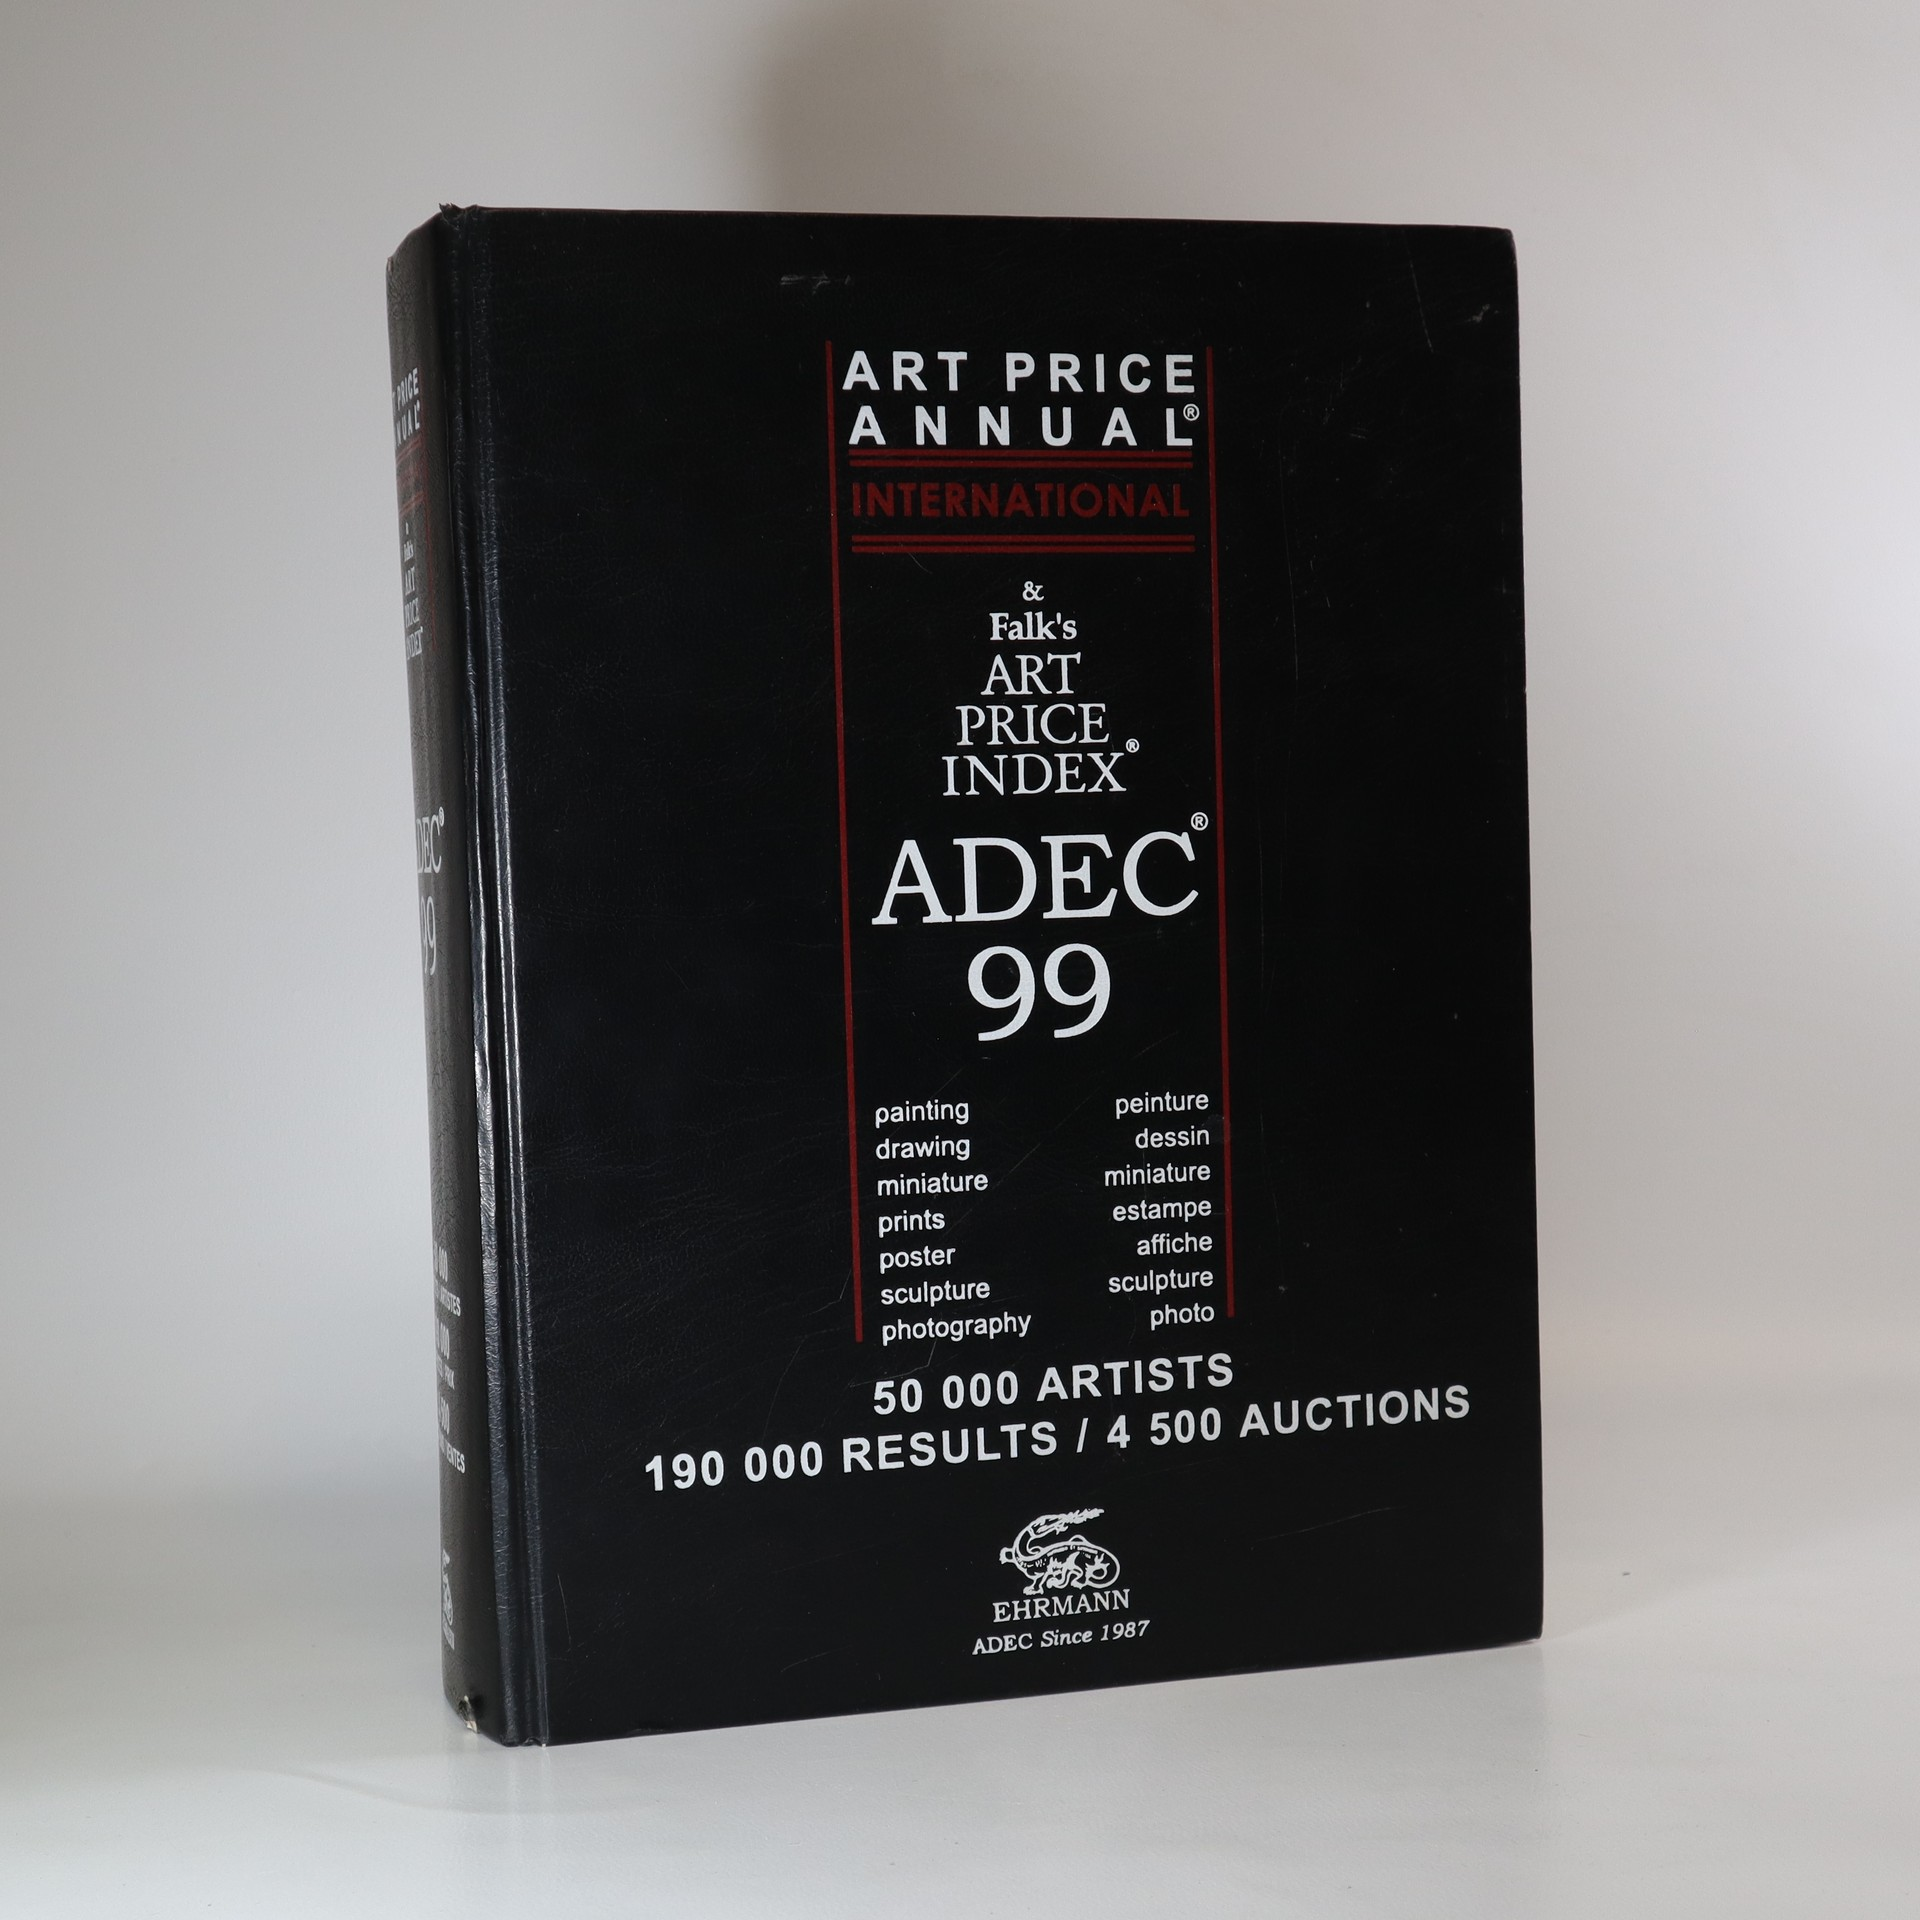 antikvární kniha ADEC 99. Art Price Annual International & Falk's Art Price Index, 1999